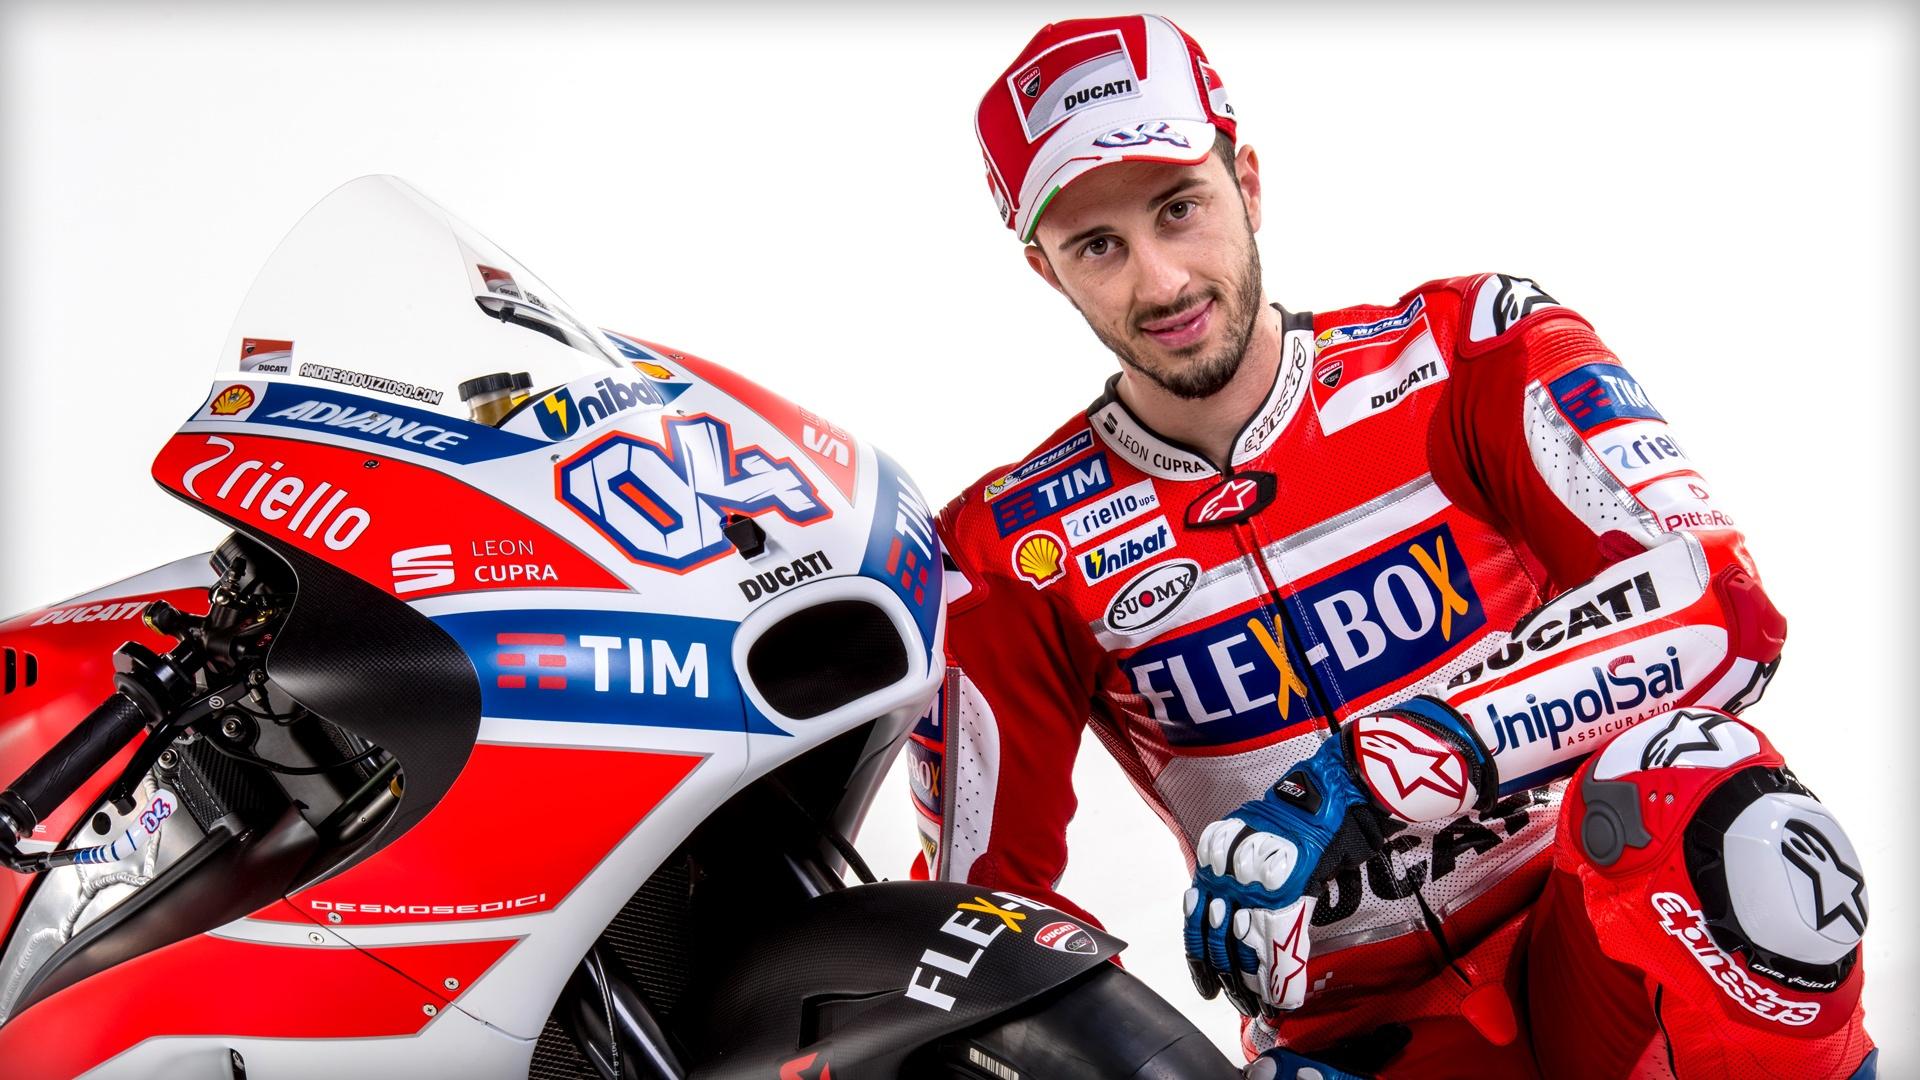 "Andrea Doviciozo: Ducati više ne može da se osloni na ""svoje staze"""